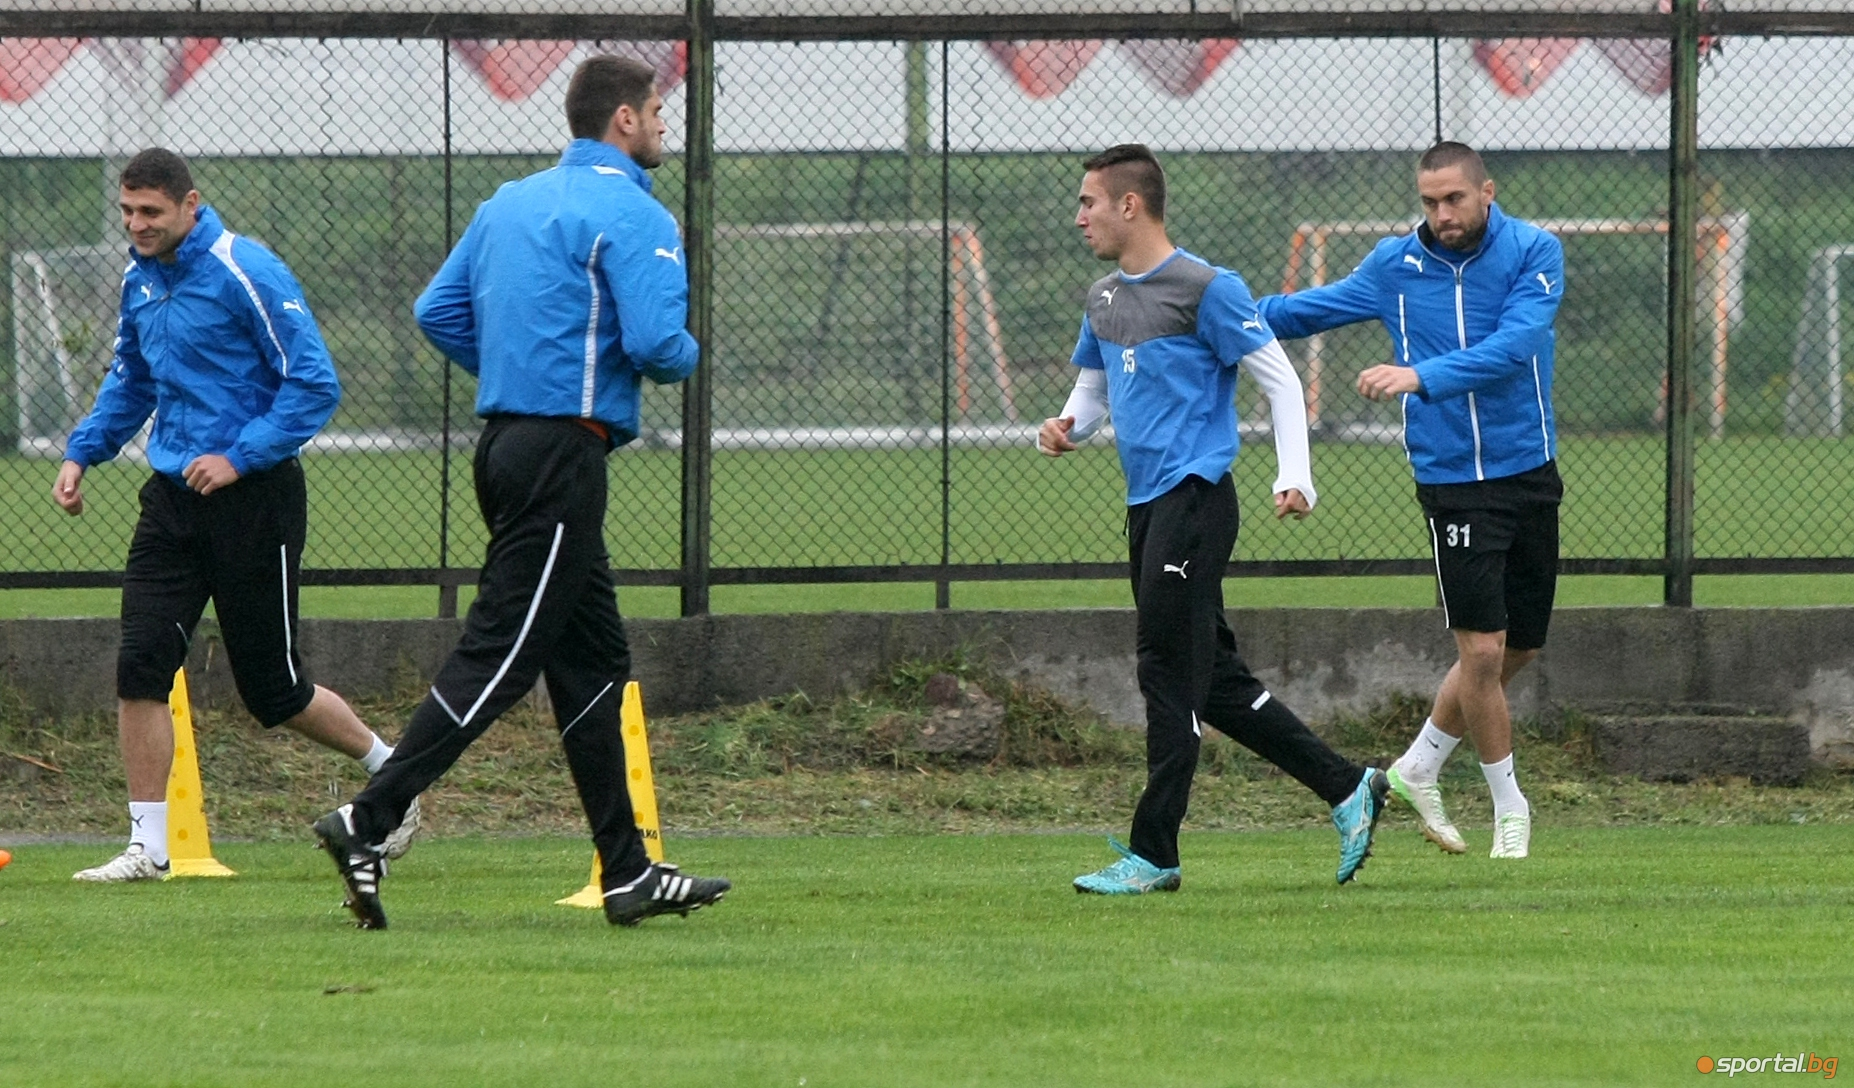 Футболистите на Левски проведоха редовната си тренировка